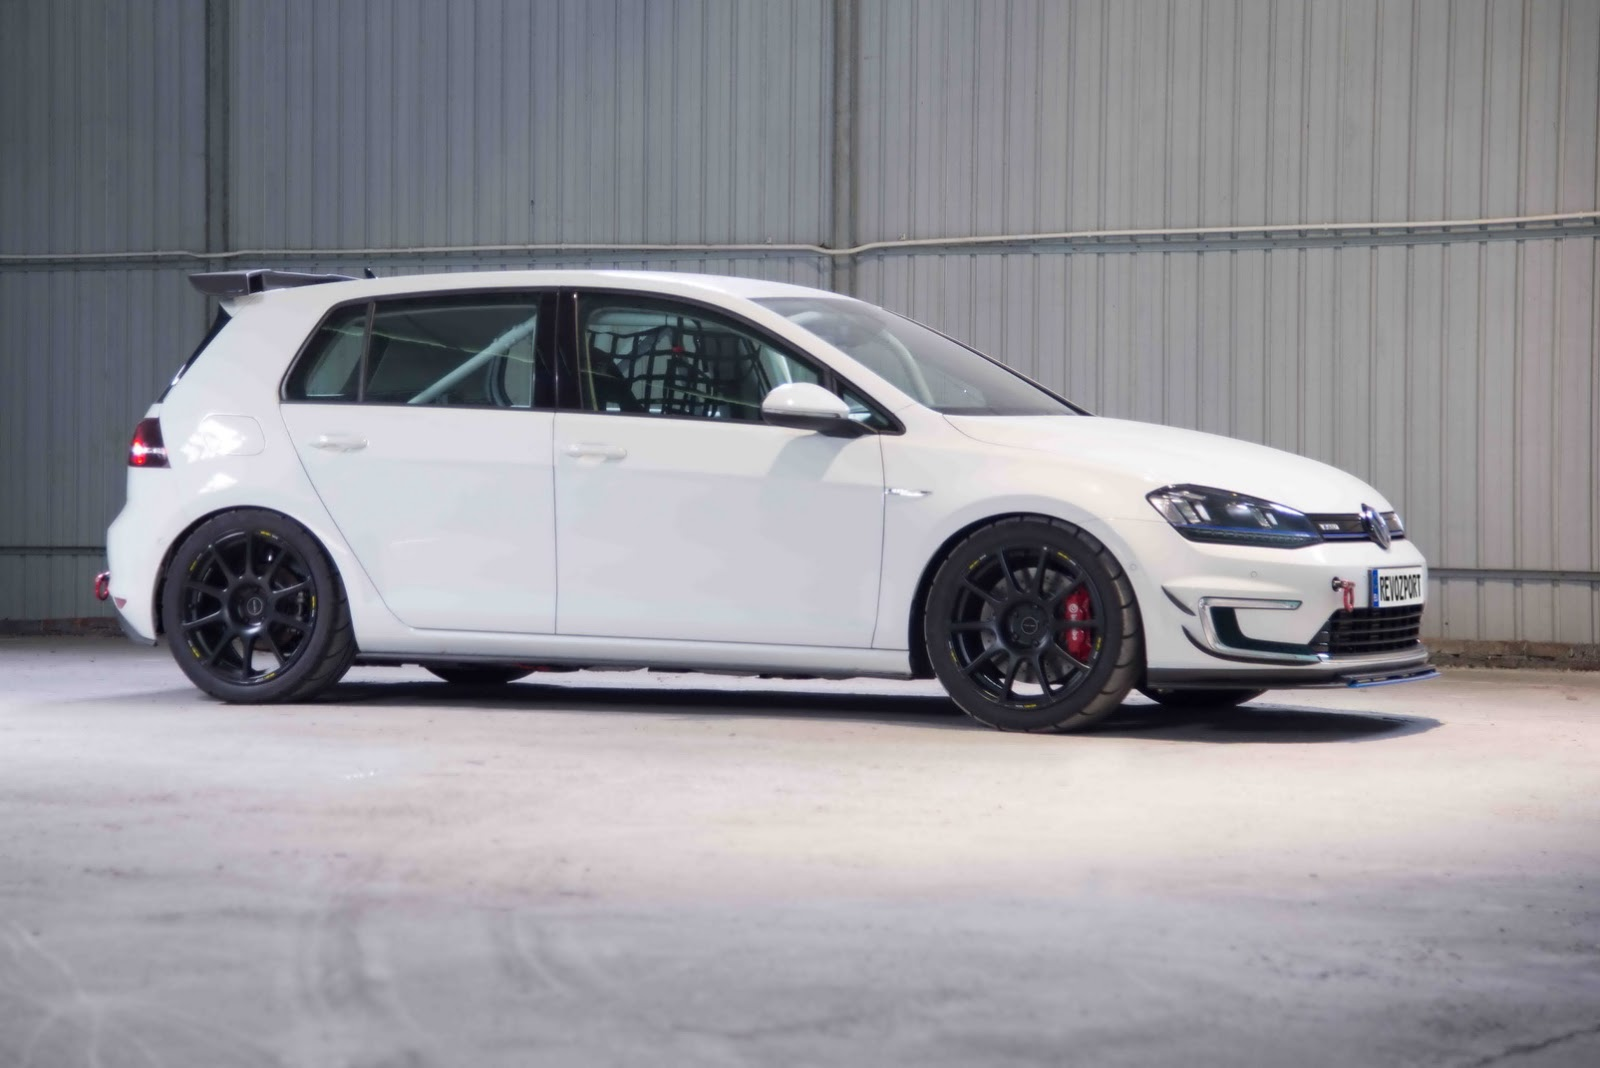 Volkswagen_e-Golf_Razor_7E_by_RevoZport_13